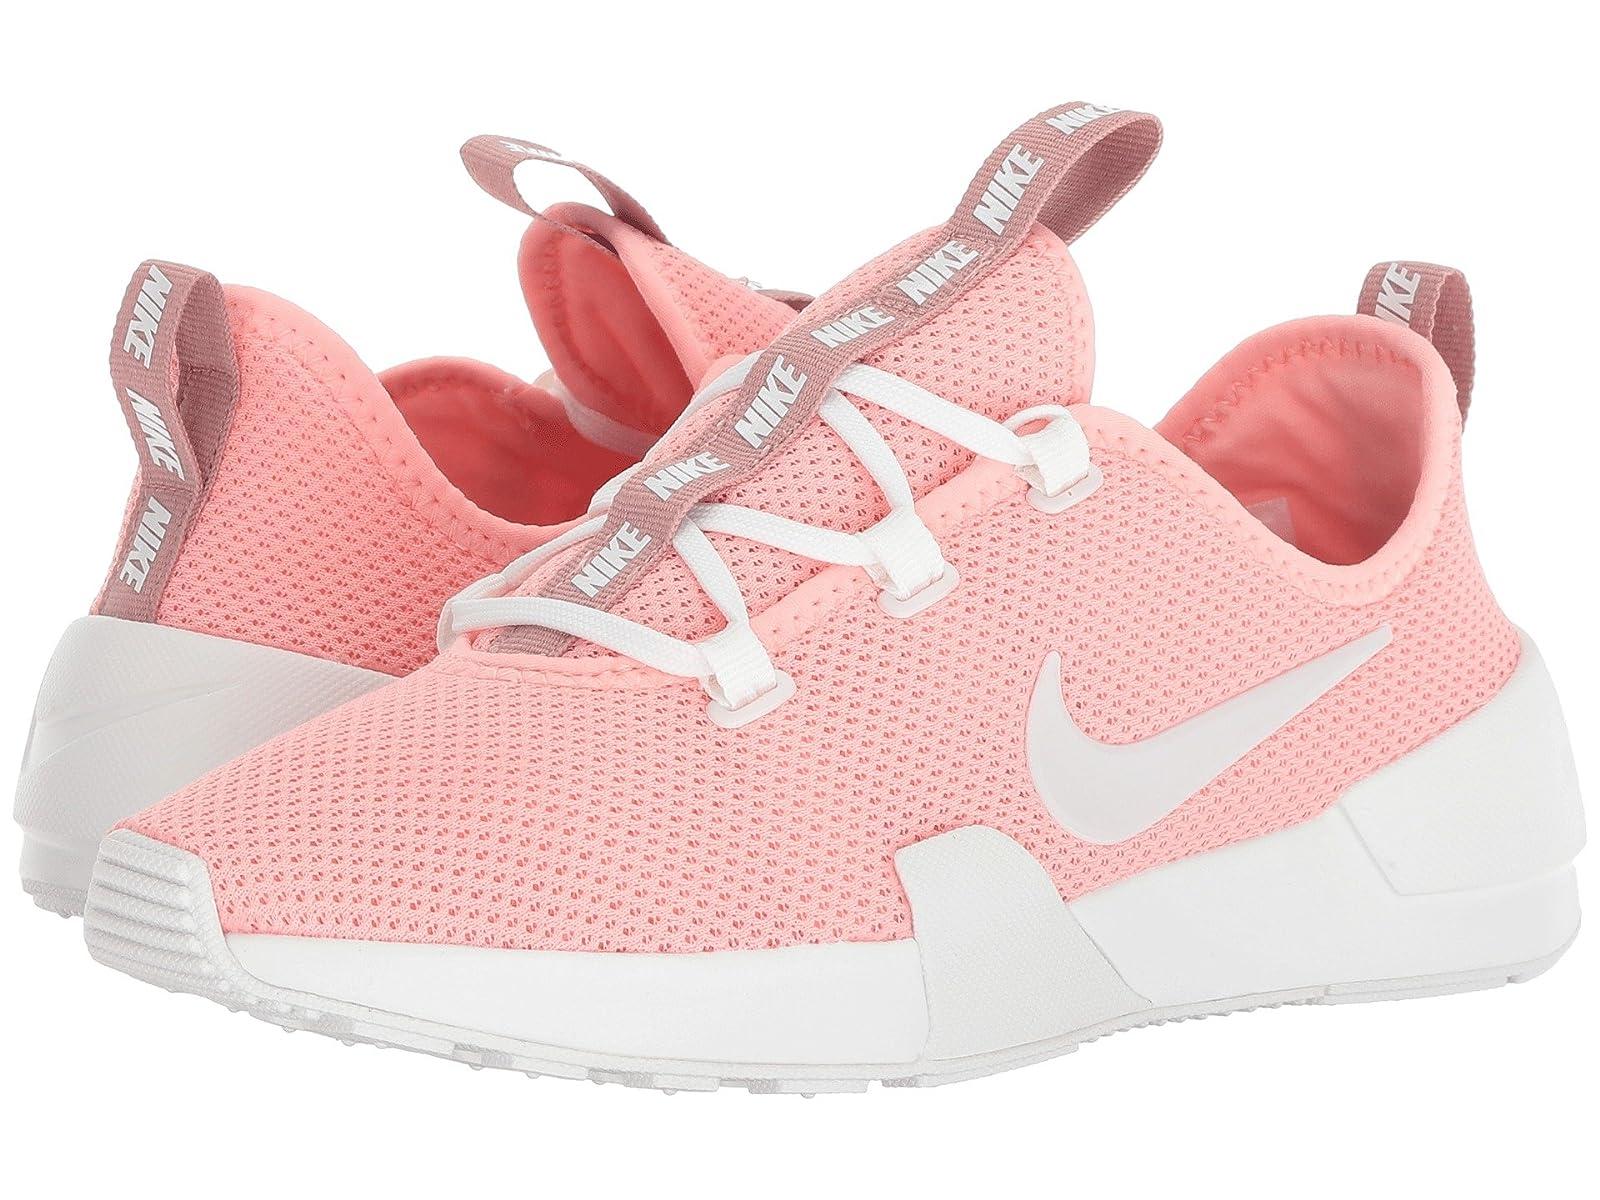 Nike Ashin ModernCheap and distinctive eye-catching shoes